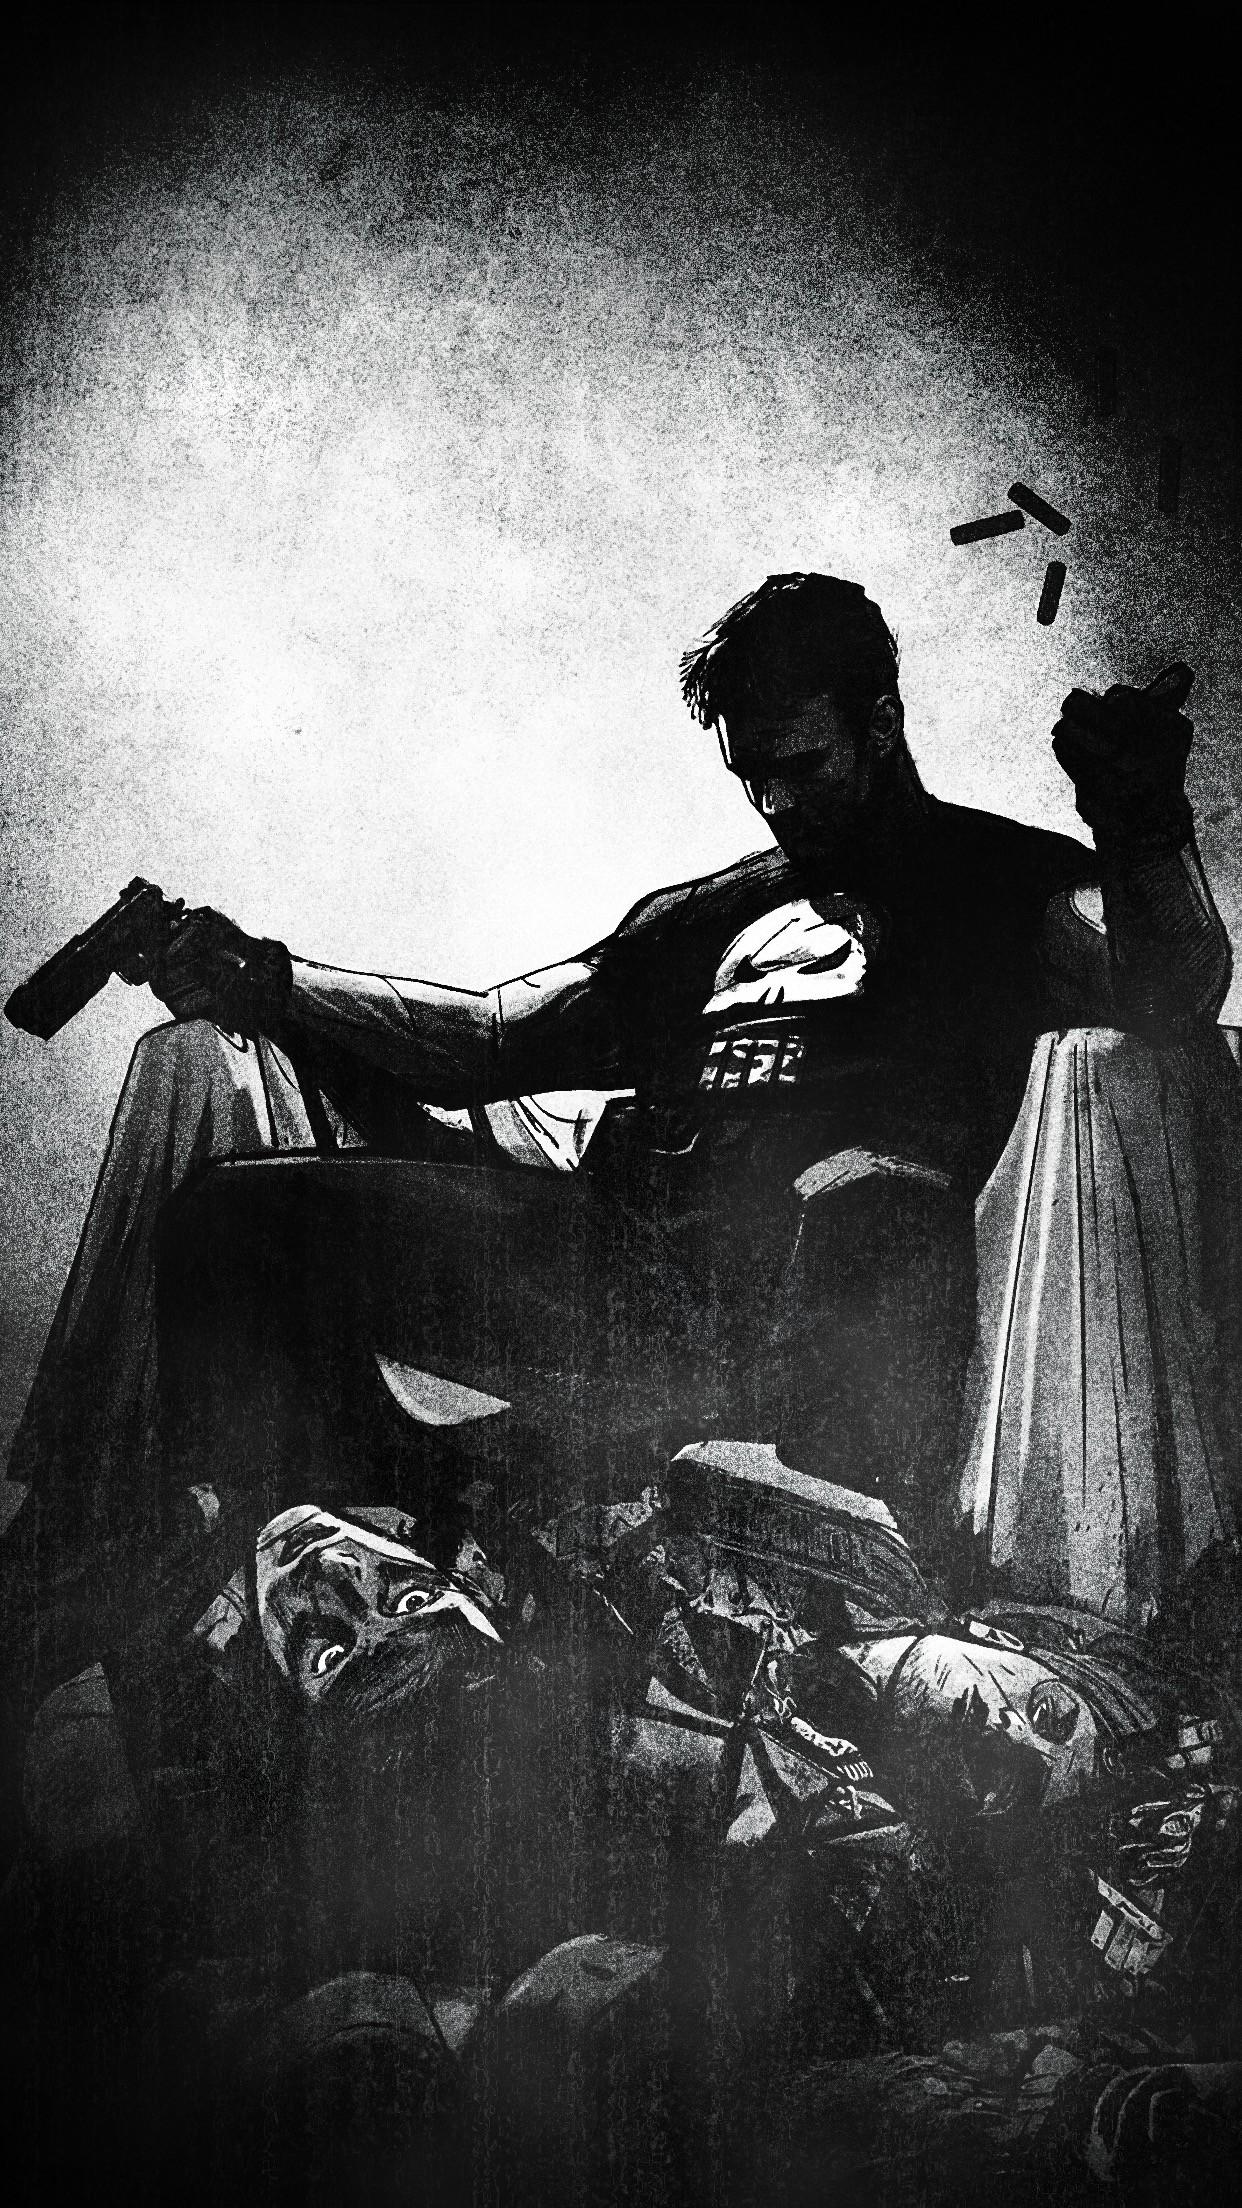 Man Who Shot Bin Laden >> Chris Kyle Punisher Logo Wallpaper (73+ images)